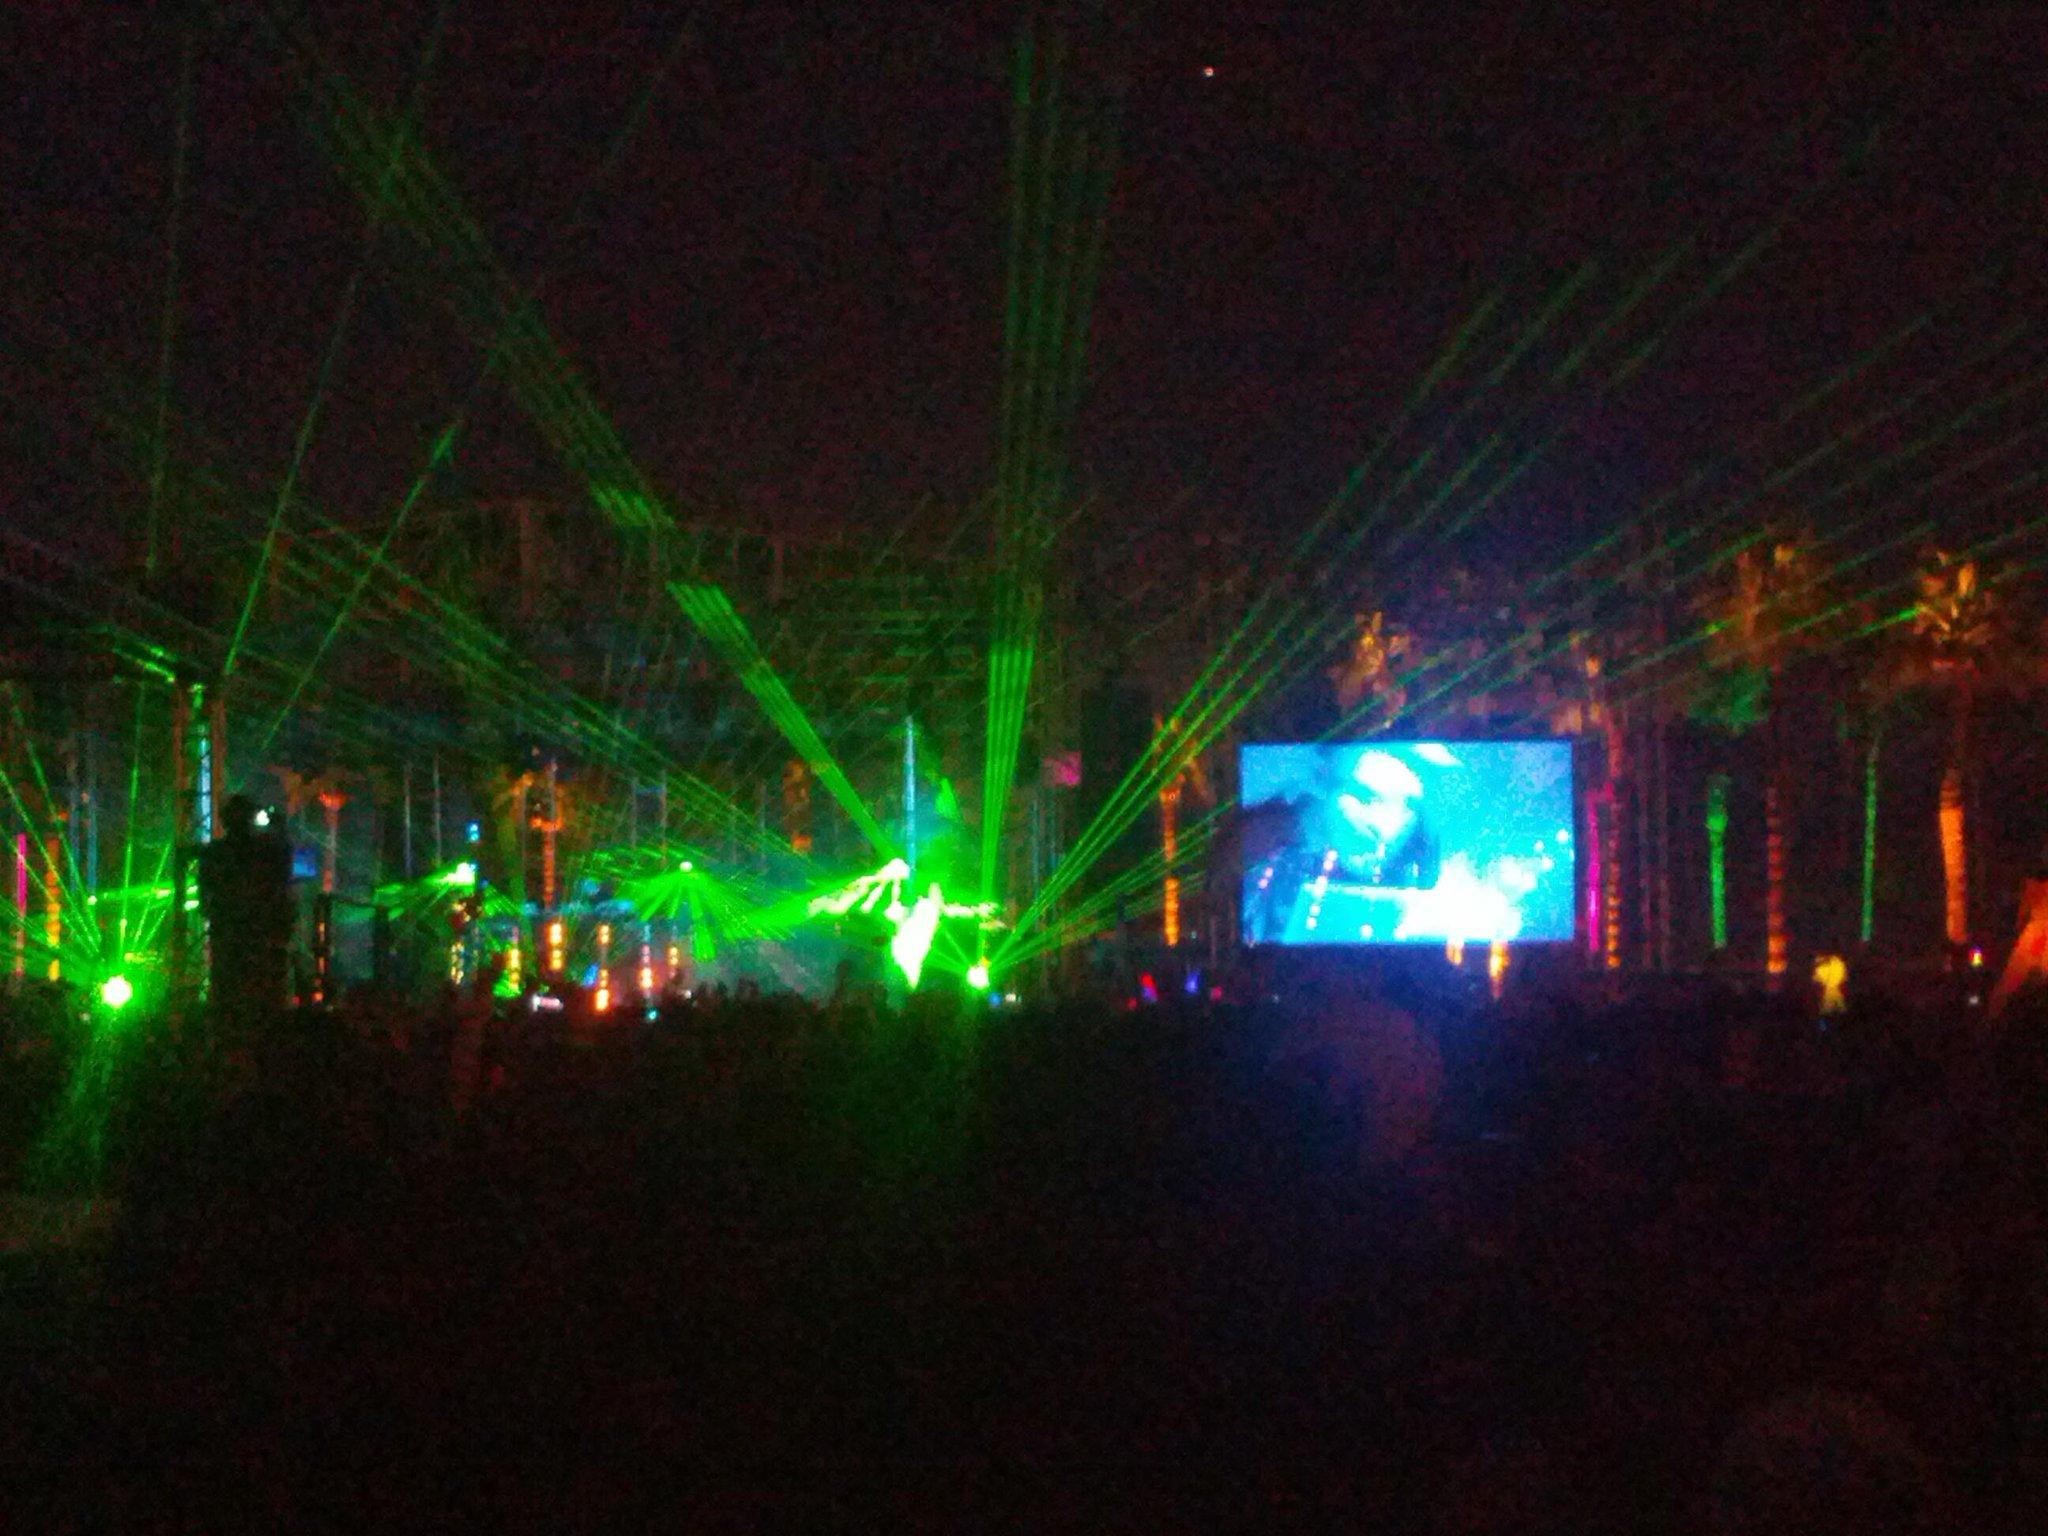 Pretty Lights #SaveFarisFest http://t.co/Mx12Zb0uxi